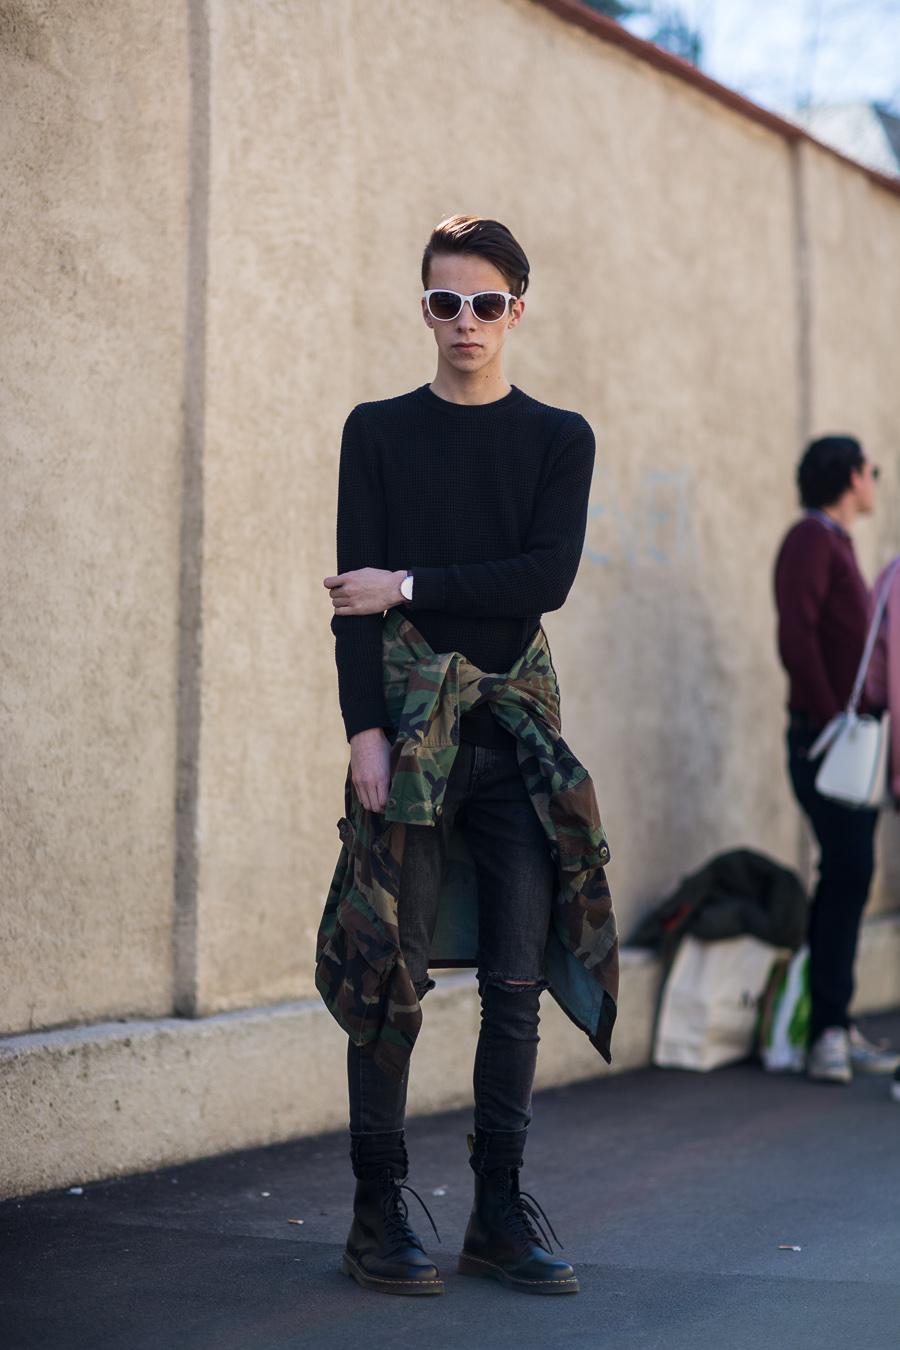 street-style-fashion-blog-innsbruck-vintage-markt-5.jpg